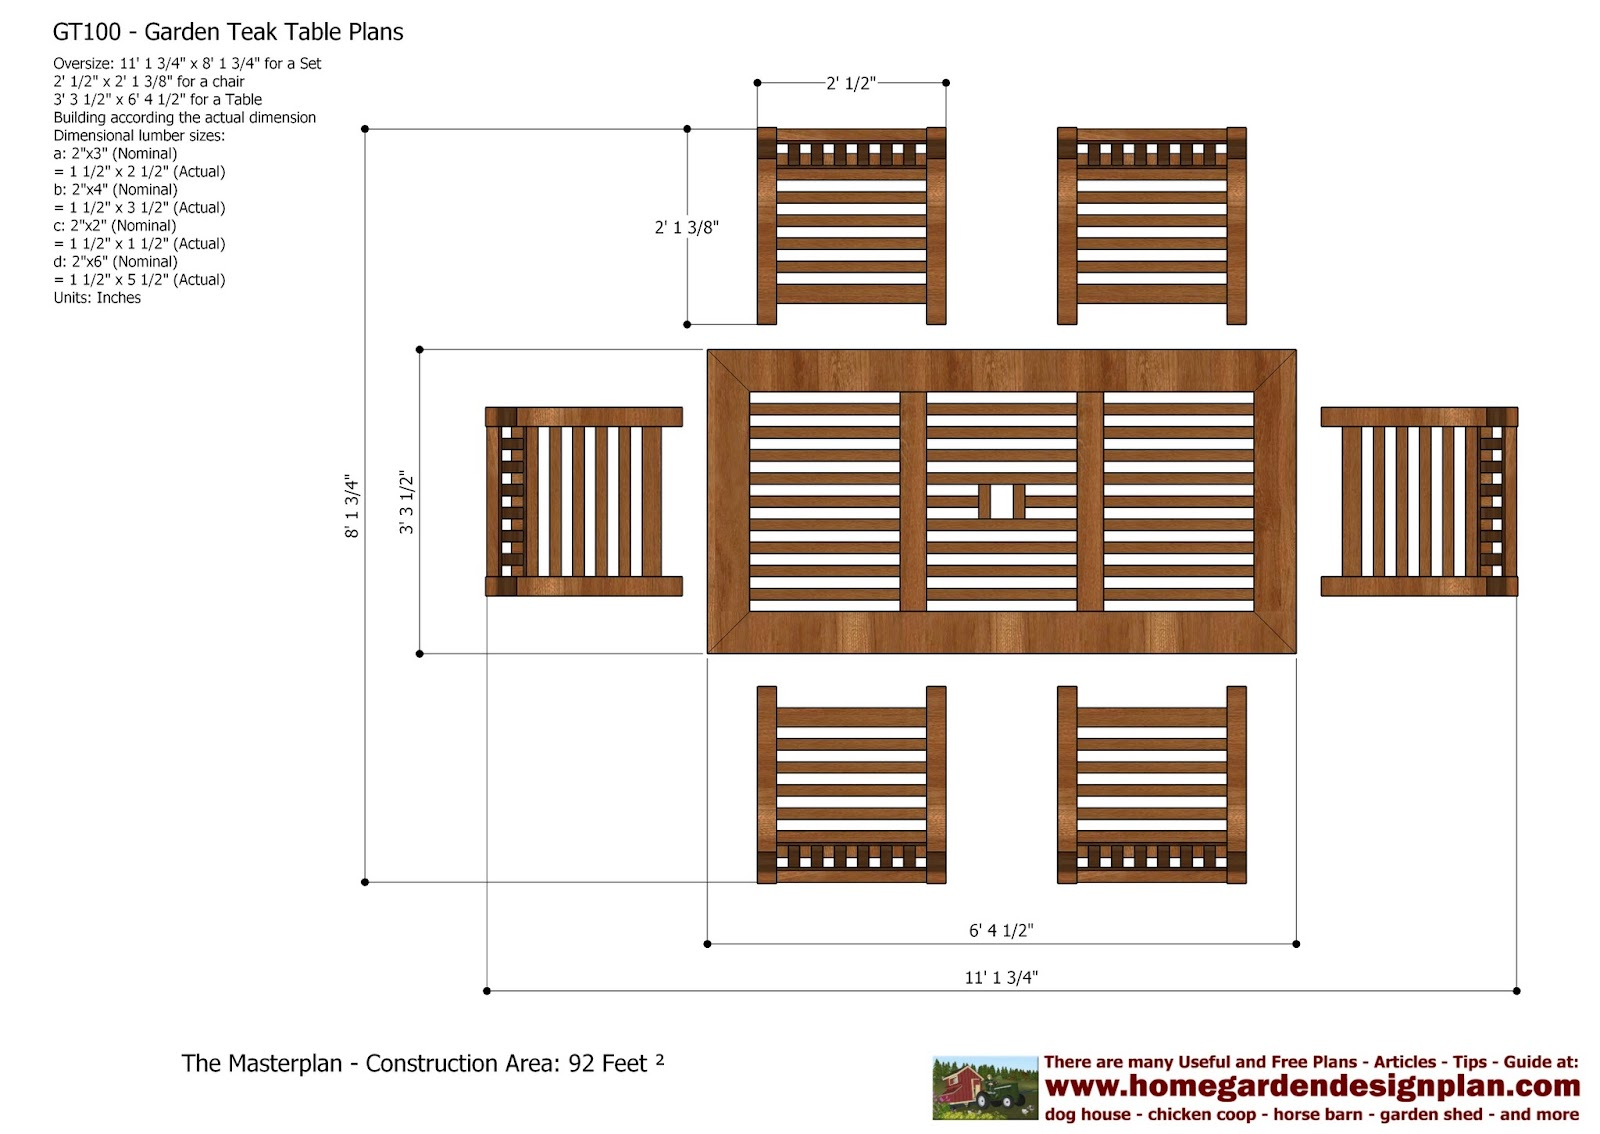 garden chair design plans ergonomic recommendation letter home gt100 teak tables